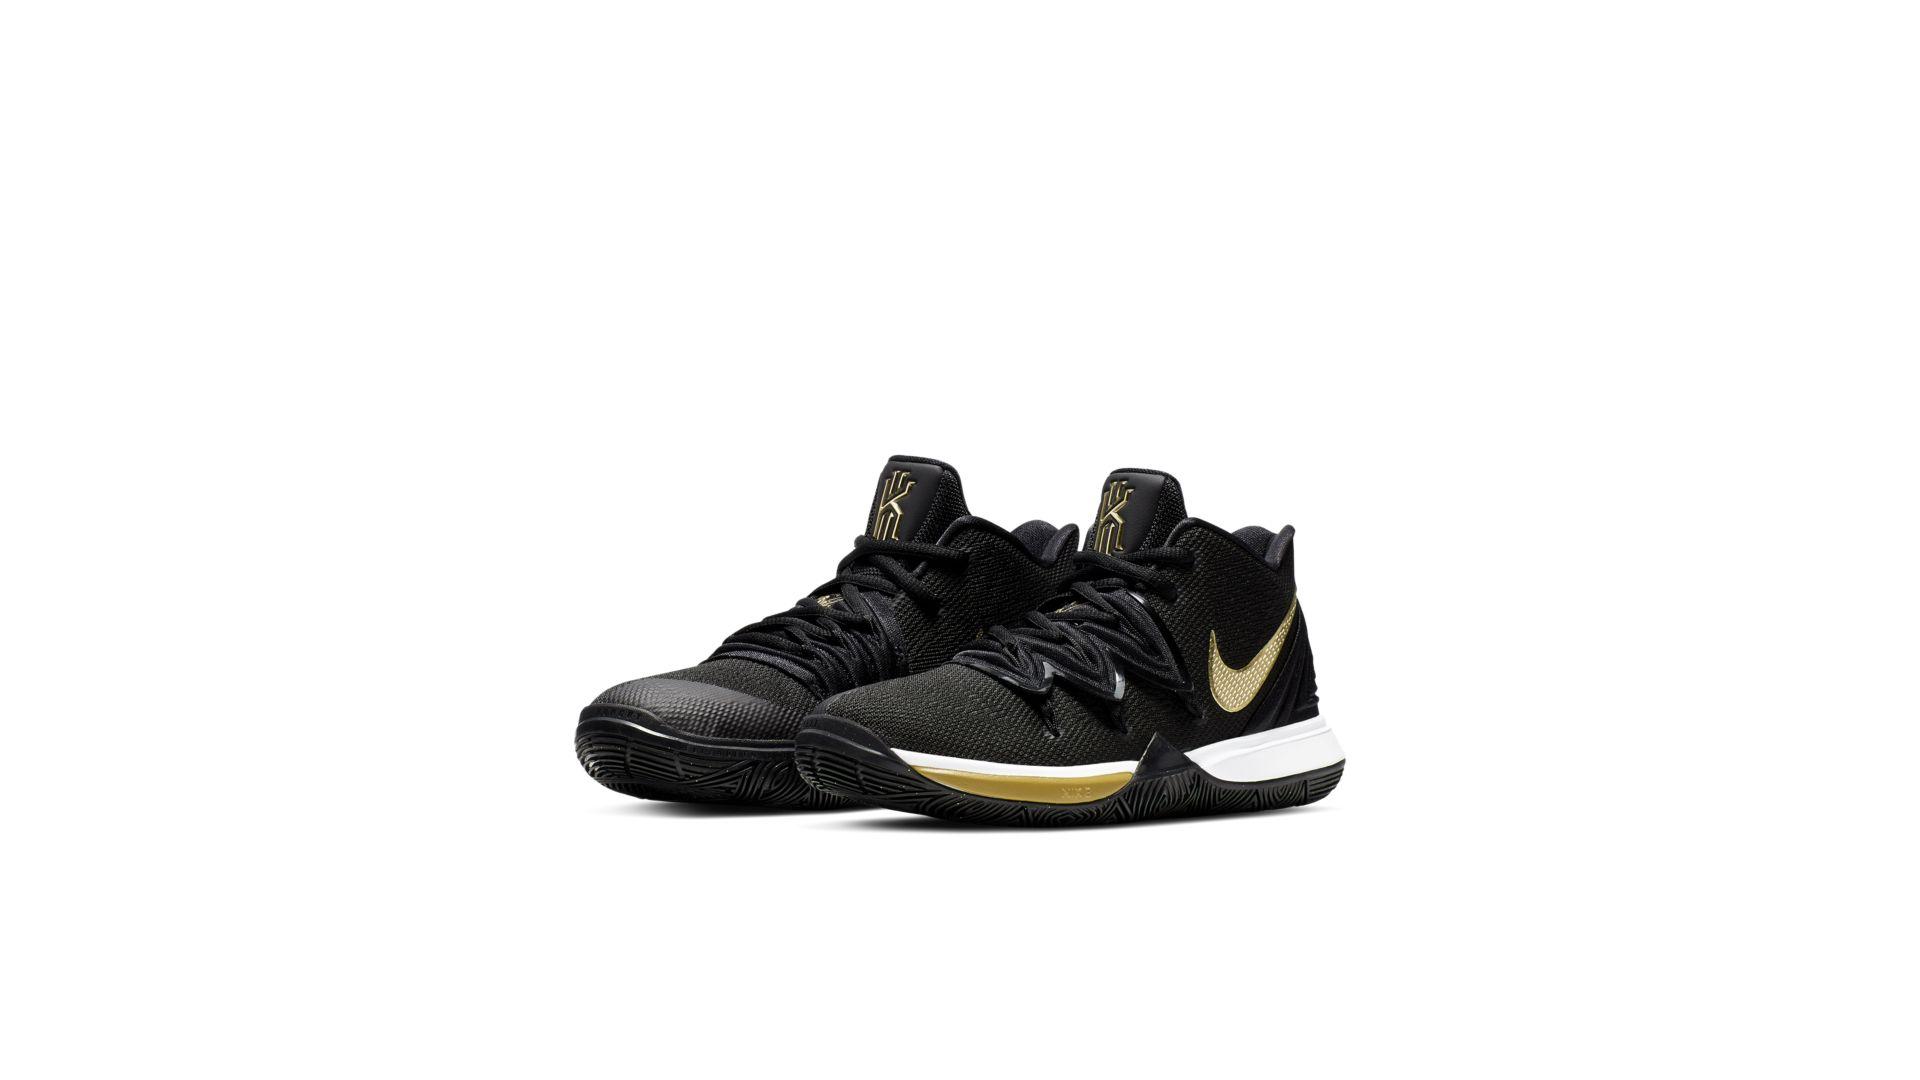 Nike Kyrie 5 Black Metallic Gold (GS) (AQ2456-007)